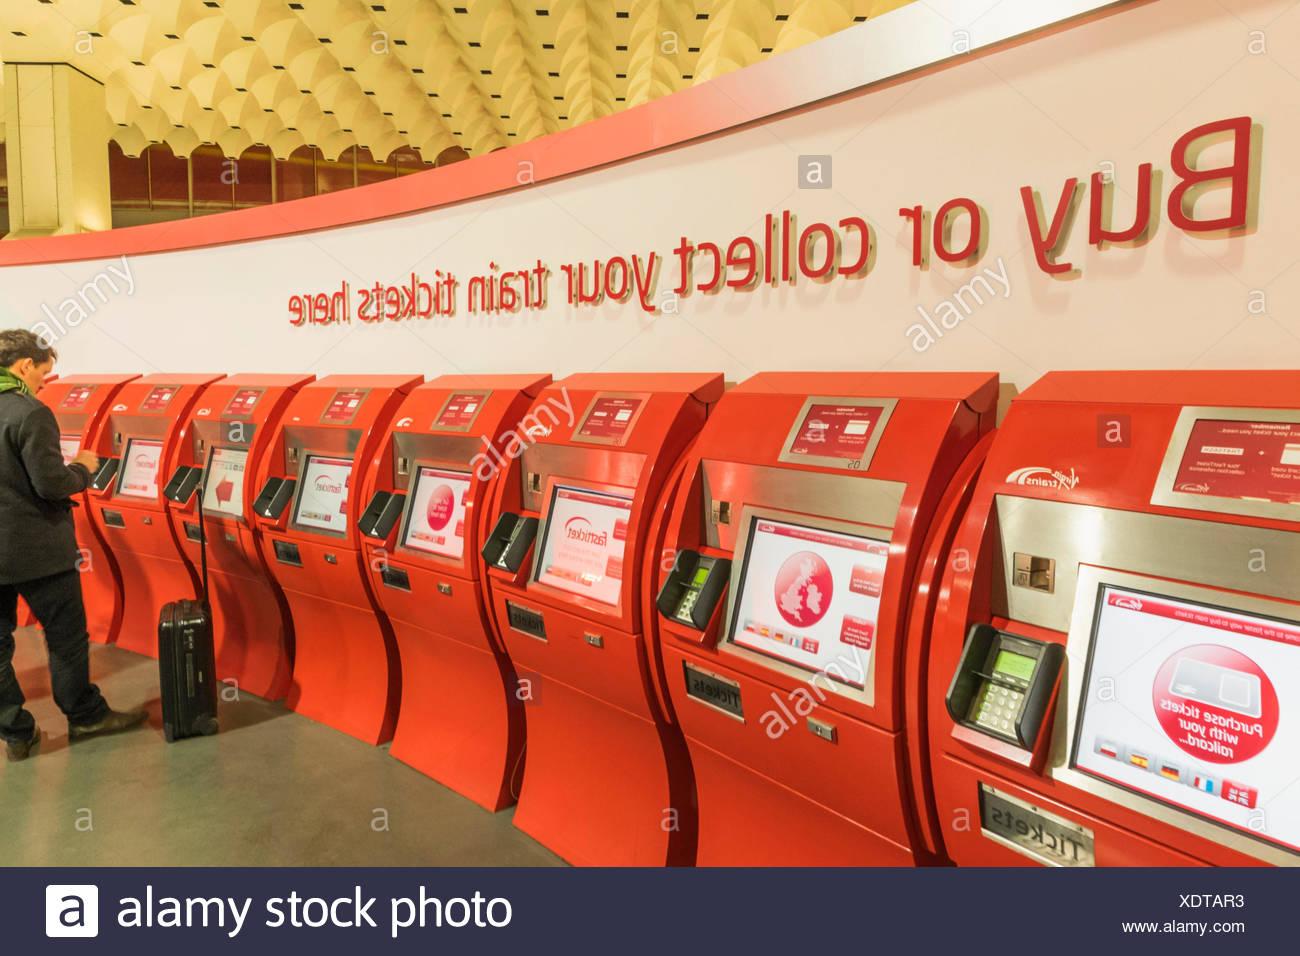 England, London, Euston Train Station, Self Service Ticket Machines - Stock Image